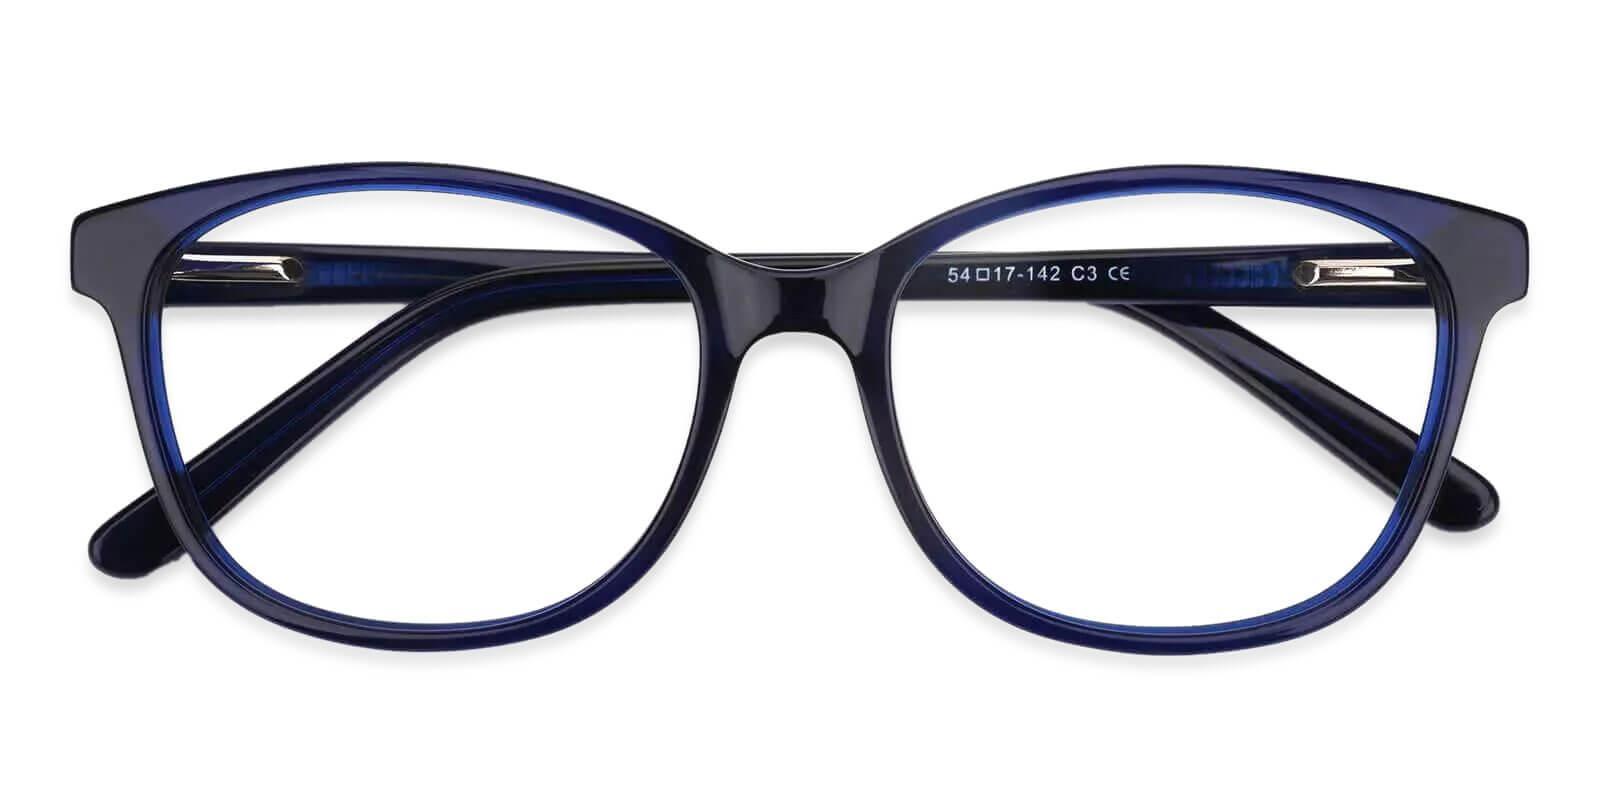 Bolivia Blue Acetate Eyeglasses , SpringHinges , UniversalBridgeFit Frames from ABBE Glasses